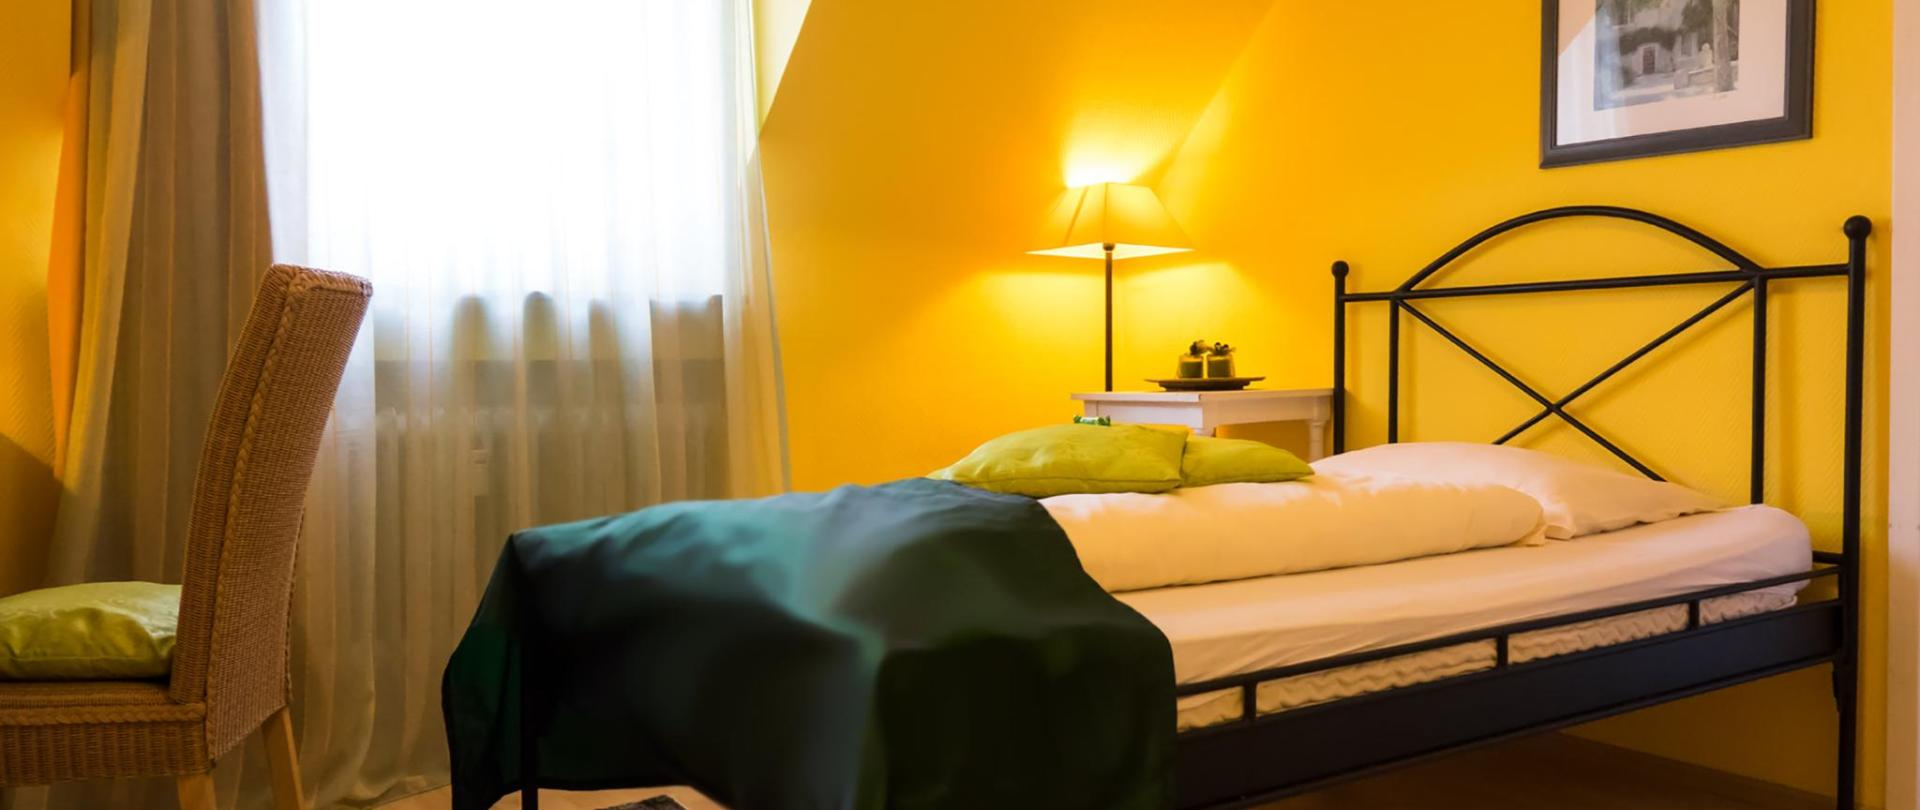 hotel-3koenige-aachen-zimmer_42-monschau_01.jpg